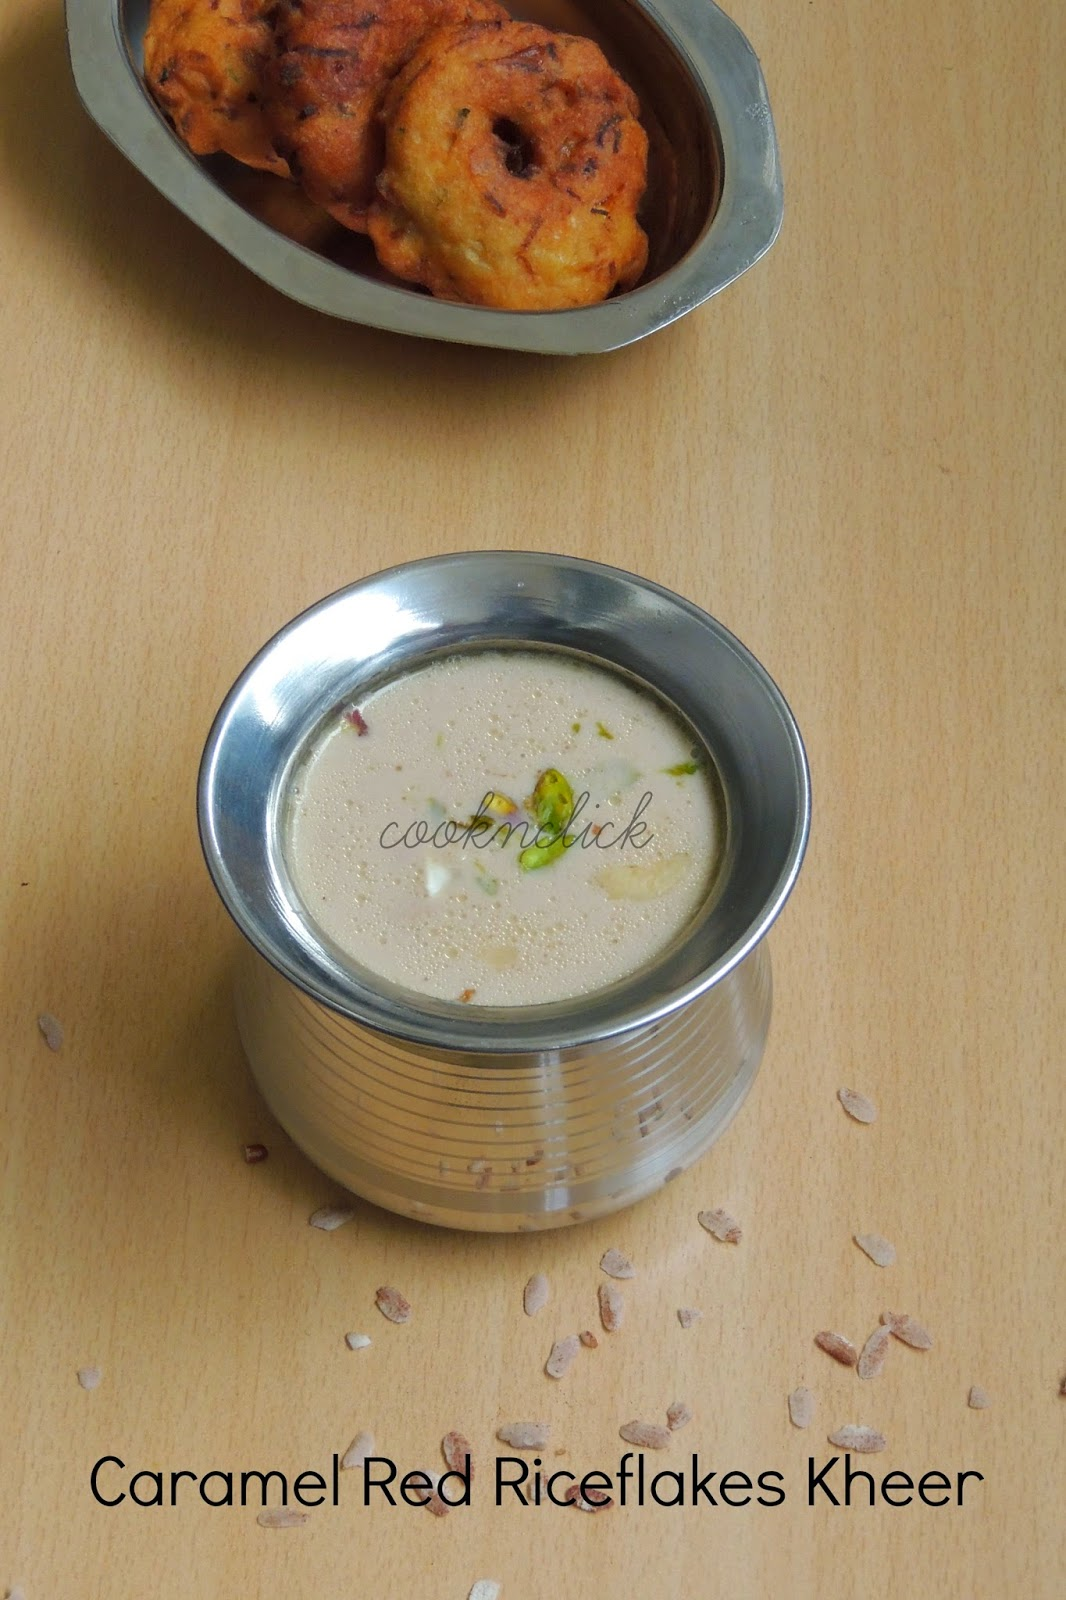 Caramel Red Riceflakes Kheer/Caramel Aval Payasam